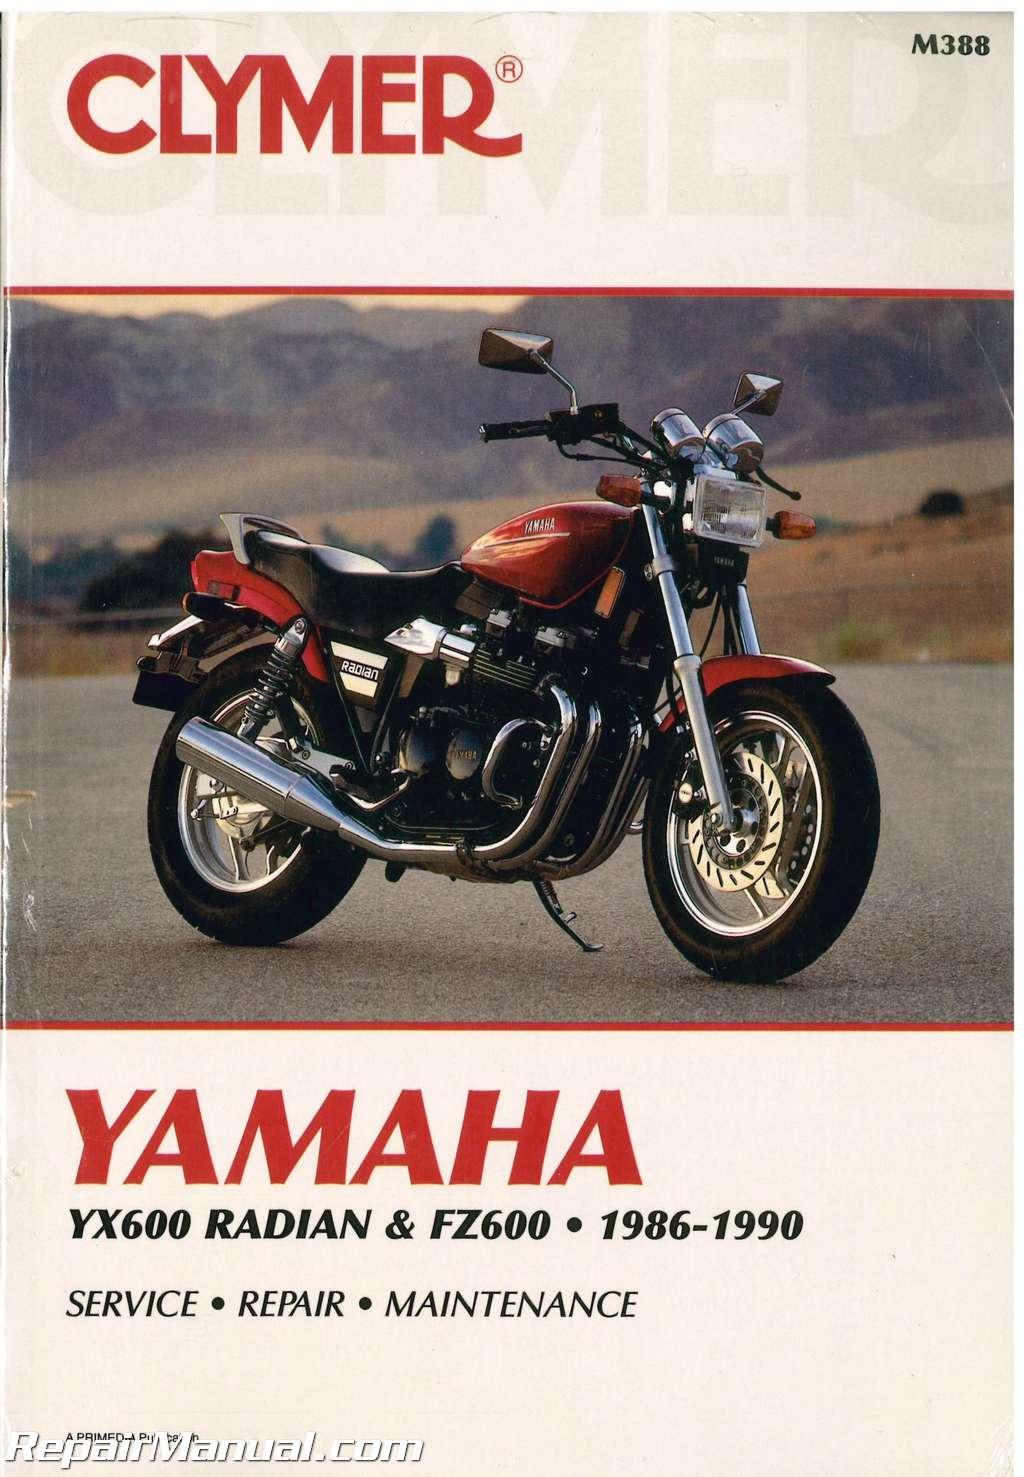 Clymer Yamaha Yx600 Radian Fz600 1986